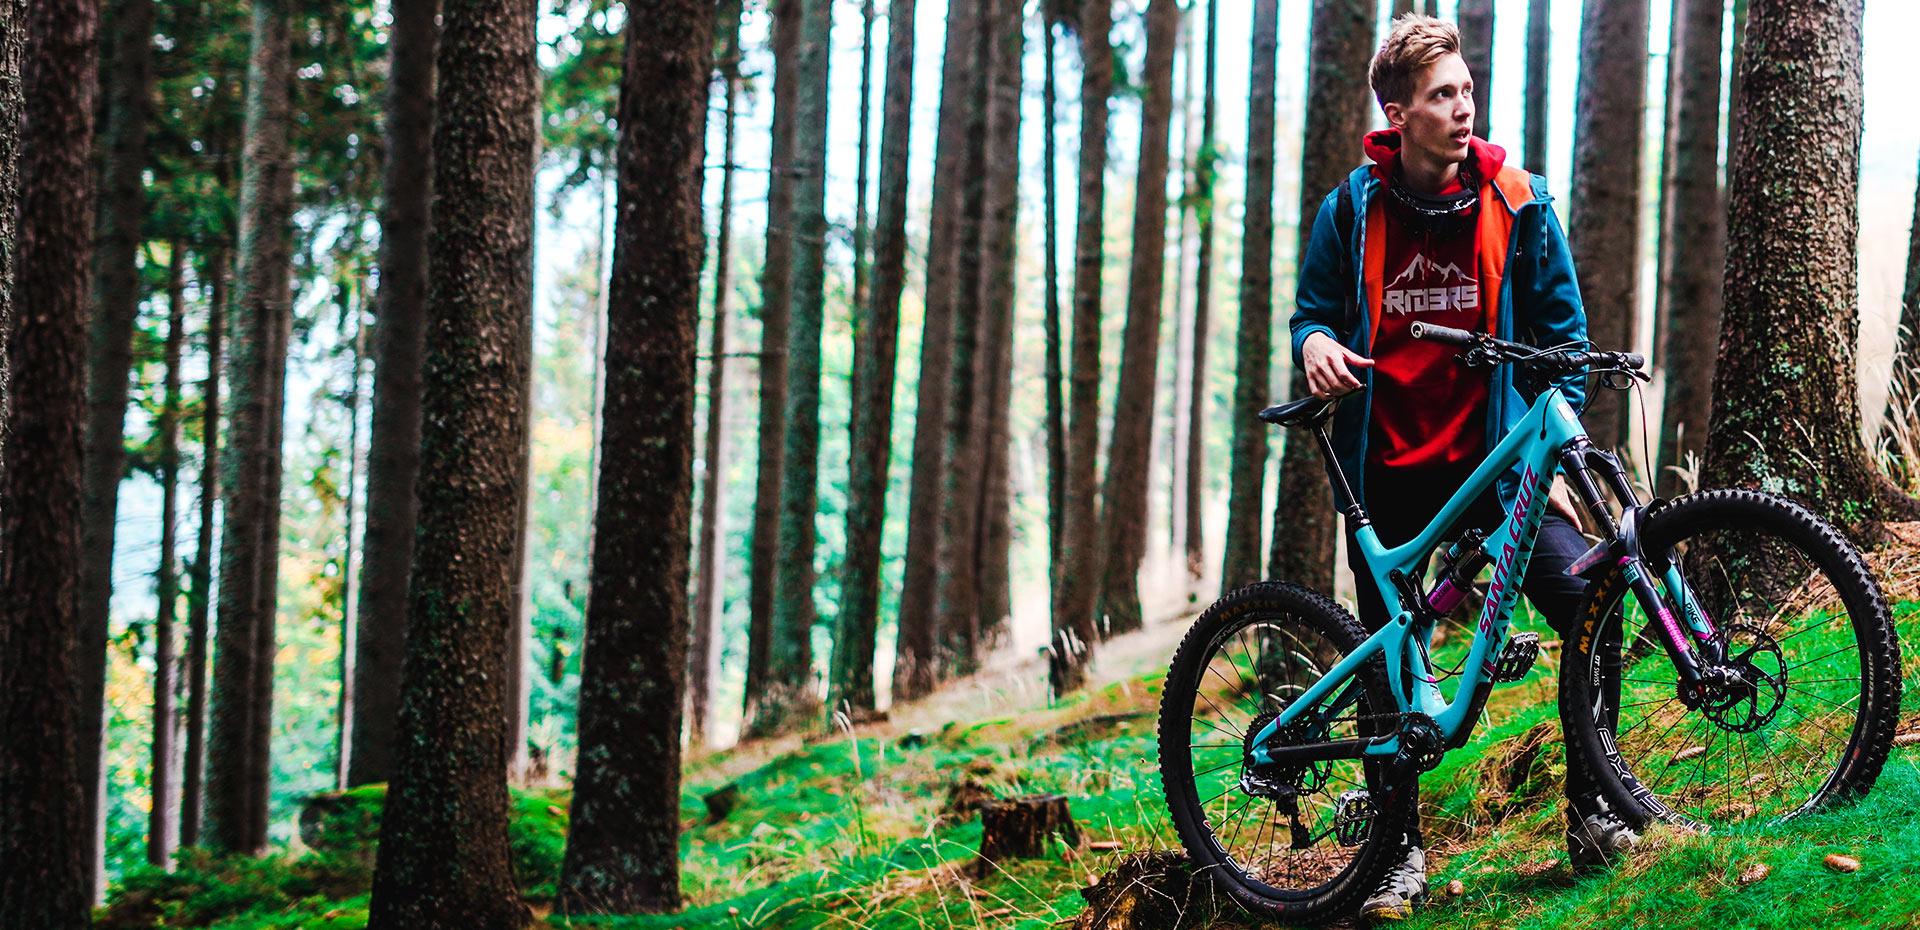 slider_riders_forest_green_latszodj